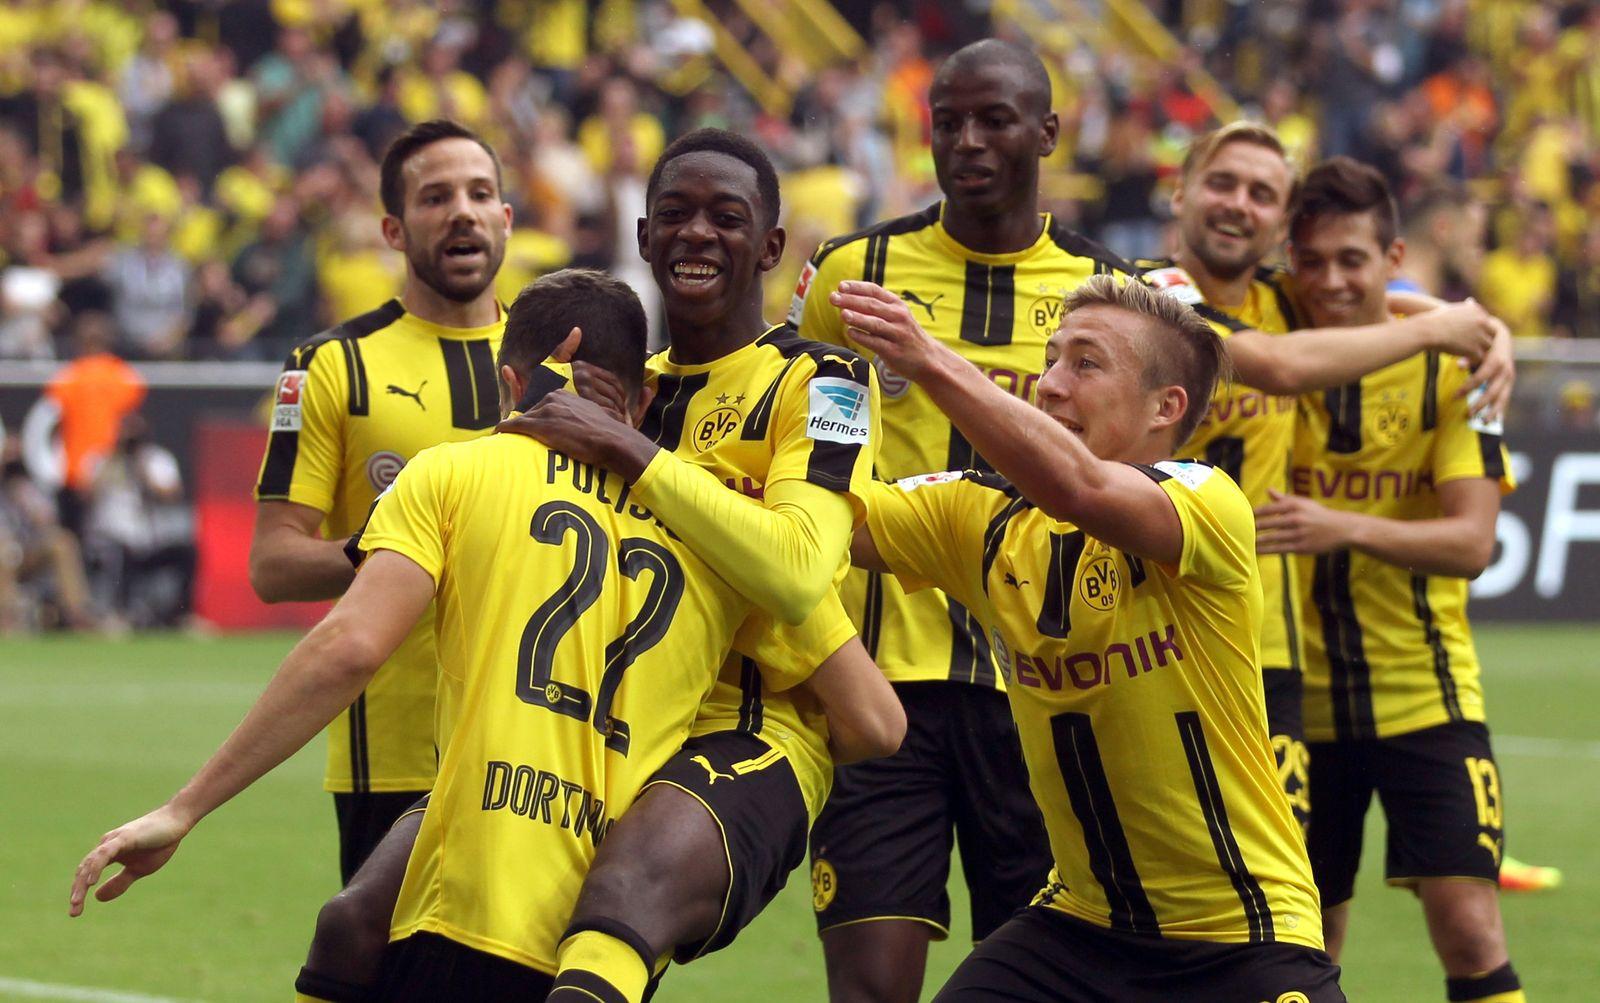 Borussia Dortmund - Darmstadt 98